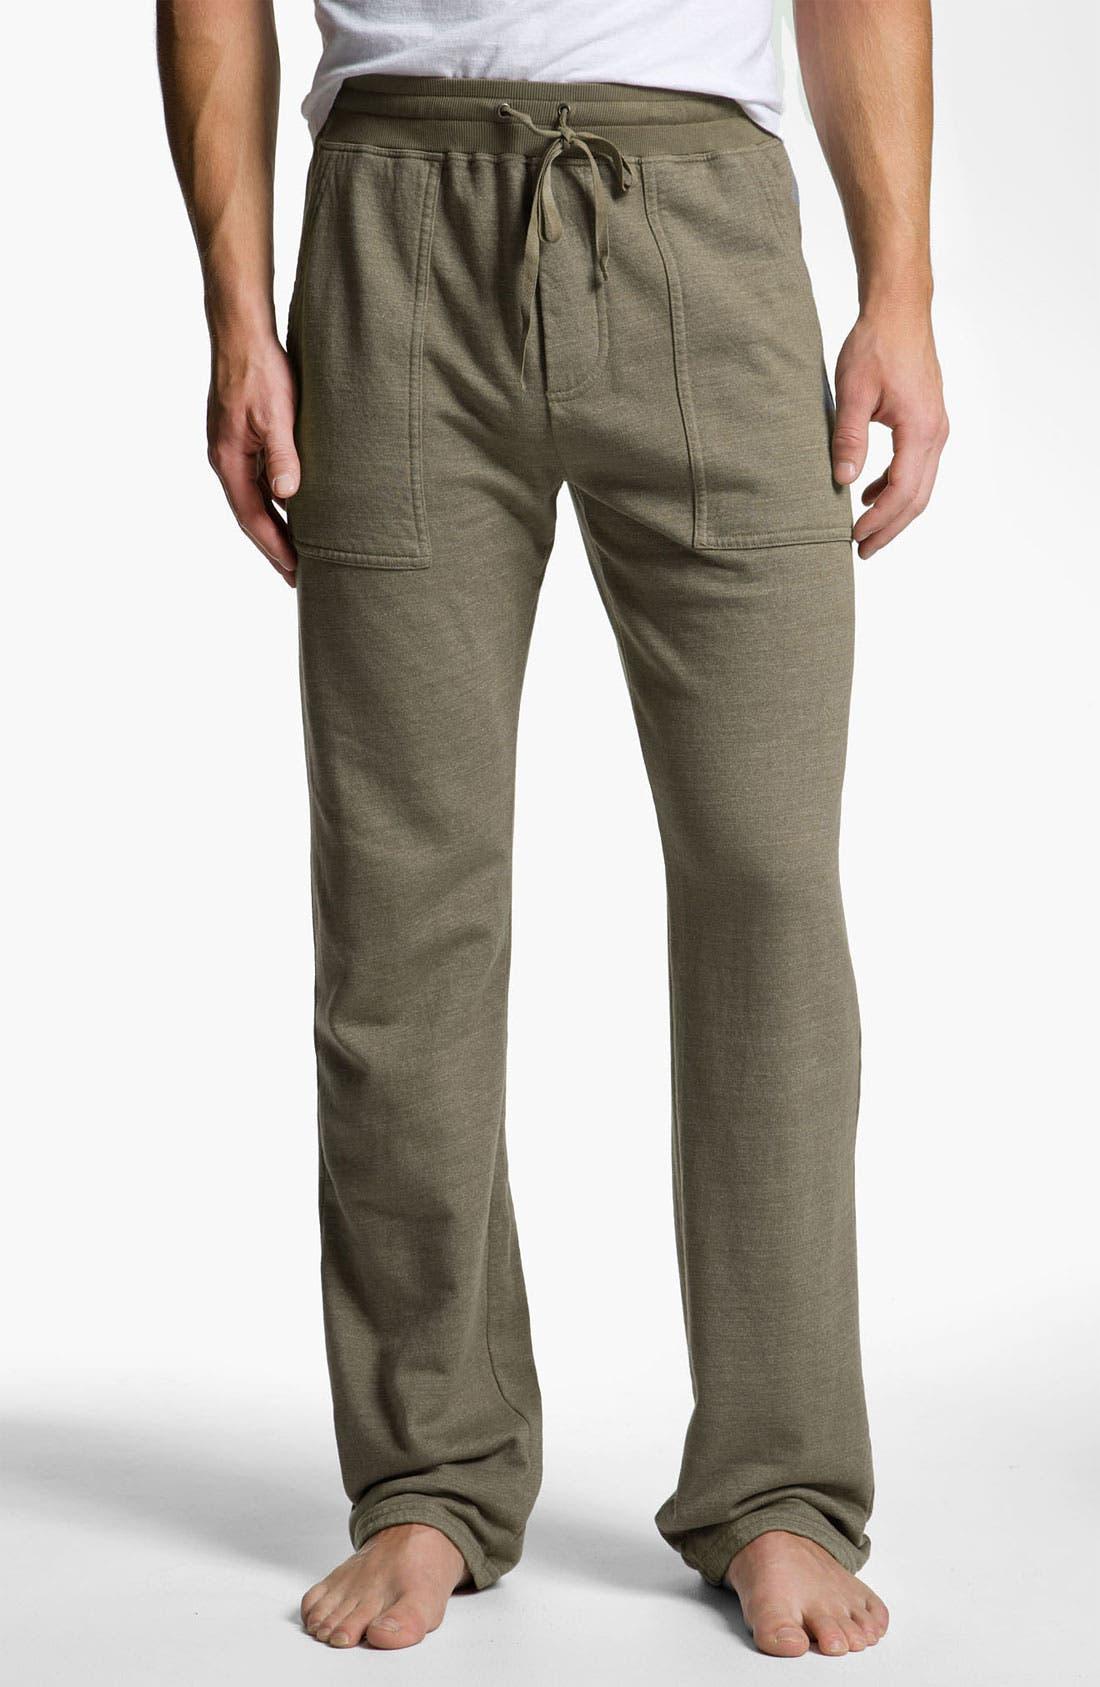 Alternate Image 1 Selected - Splendid Mills 'Dane' Slim Straight Leg Lounge Pants